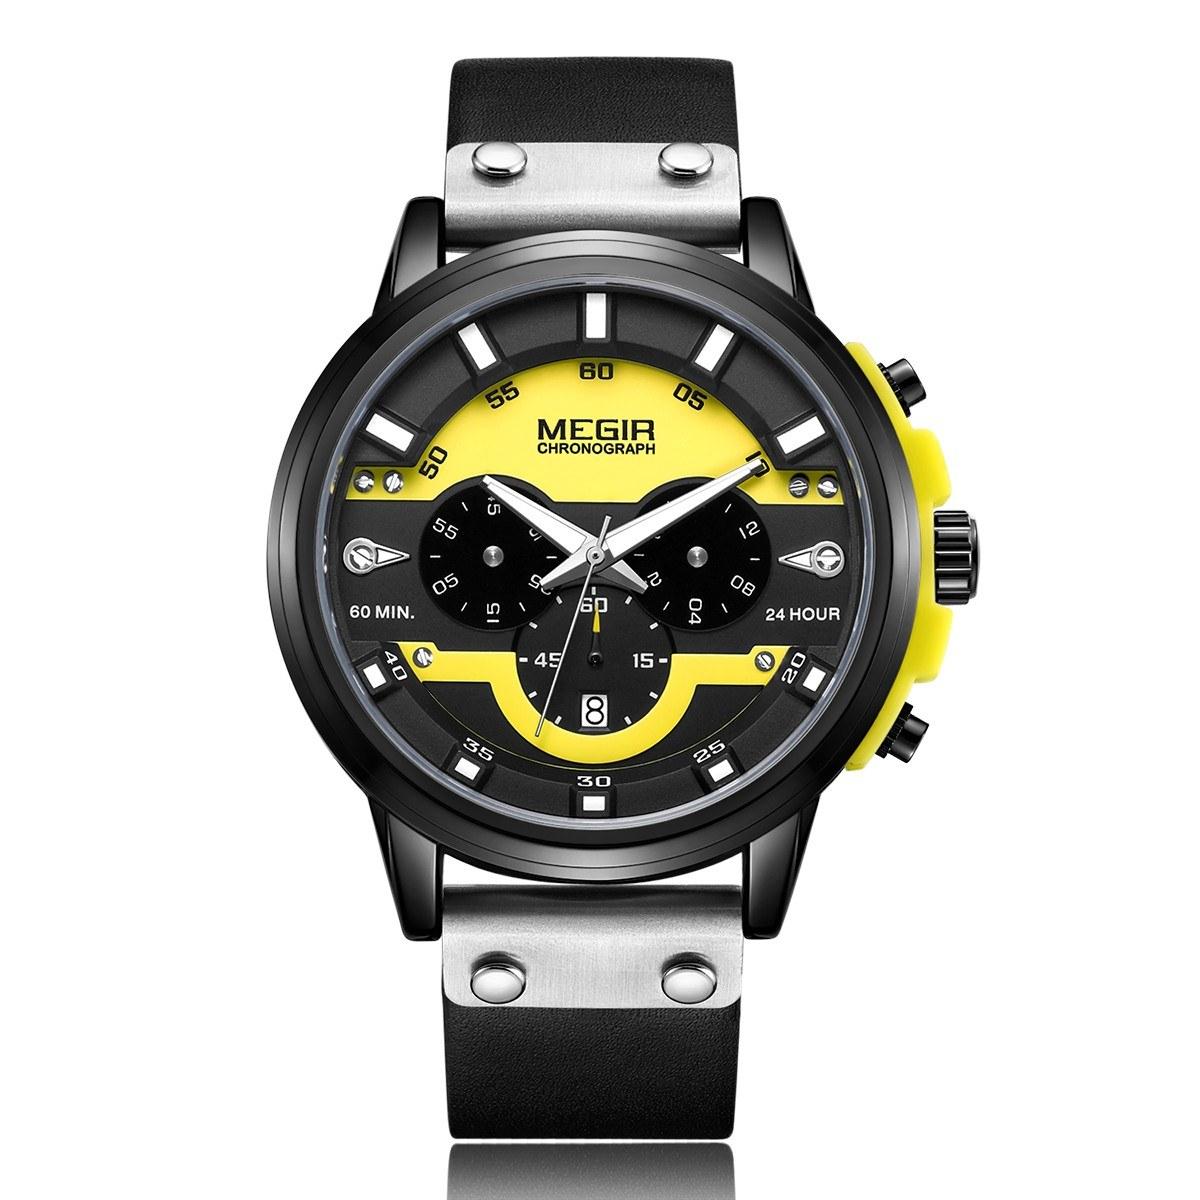 megir 2080 Fashion Quartz Sports Men Watch Multifunctional 3 Dials Chronograph 3ATM Waterproof Luminous Hands Wrist Watch Second/Minute/Hour Chronograph Sub-dials Calendar with Leather Strap